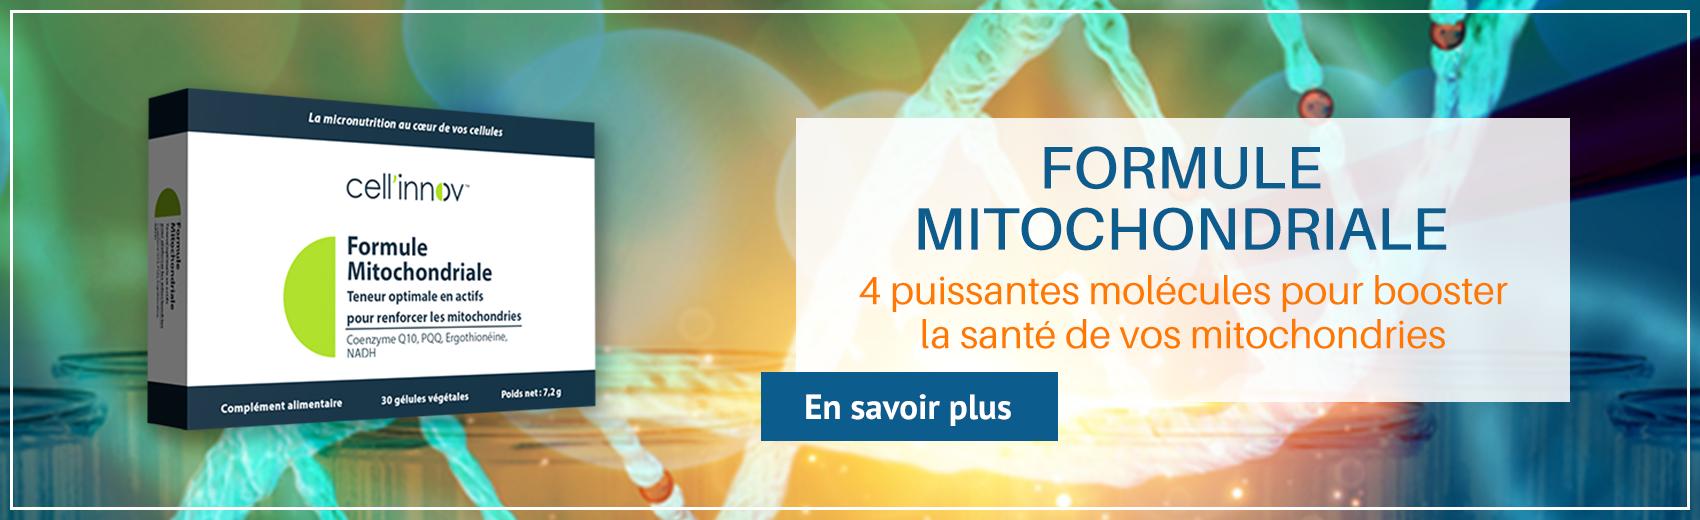 Formule-Mitochondriale